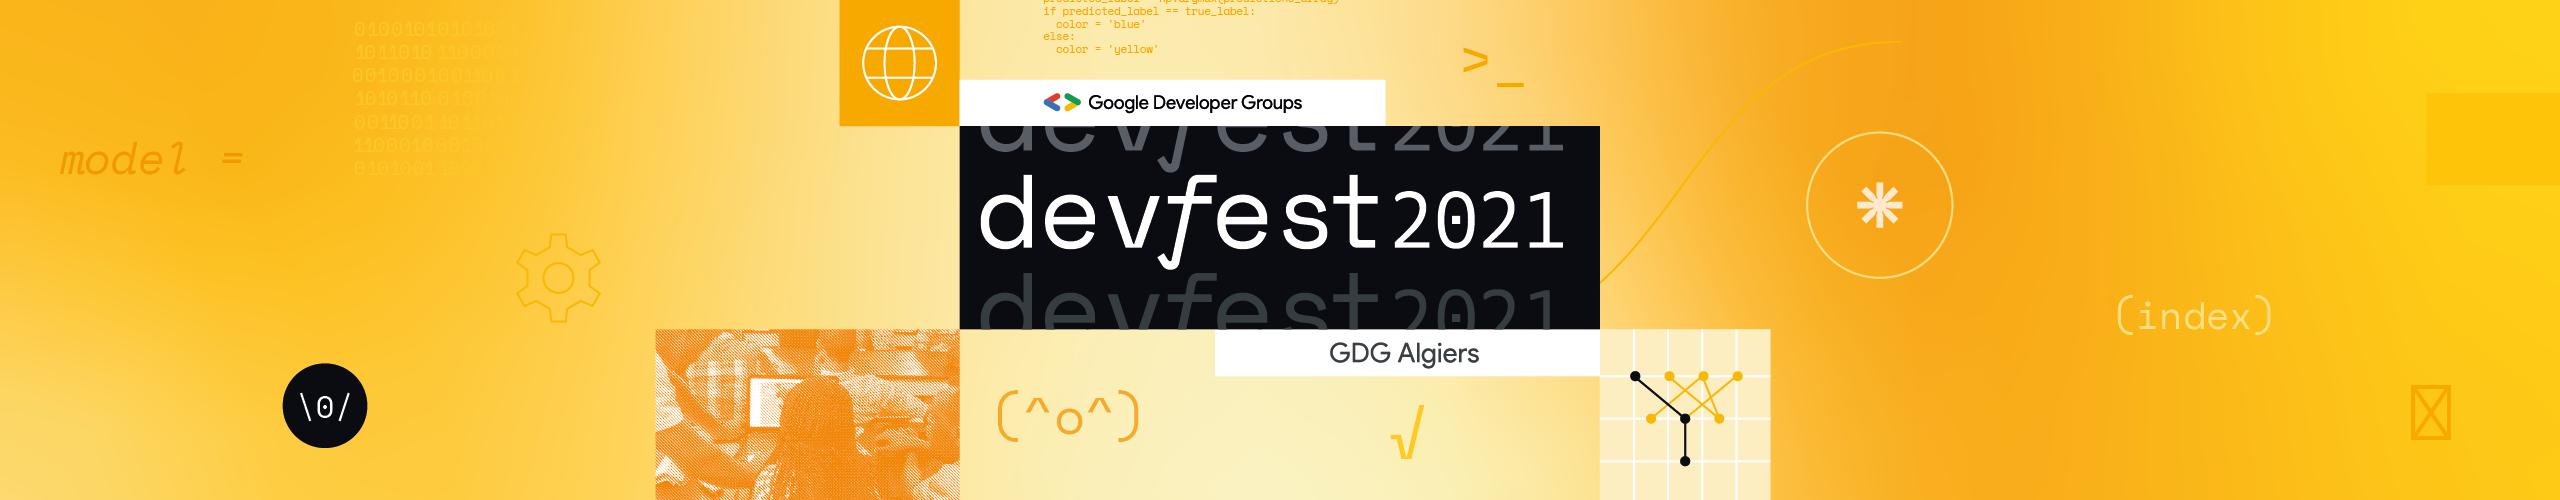 DevFest, or